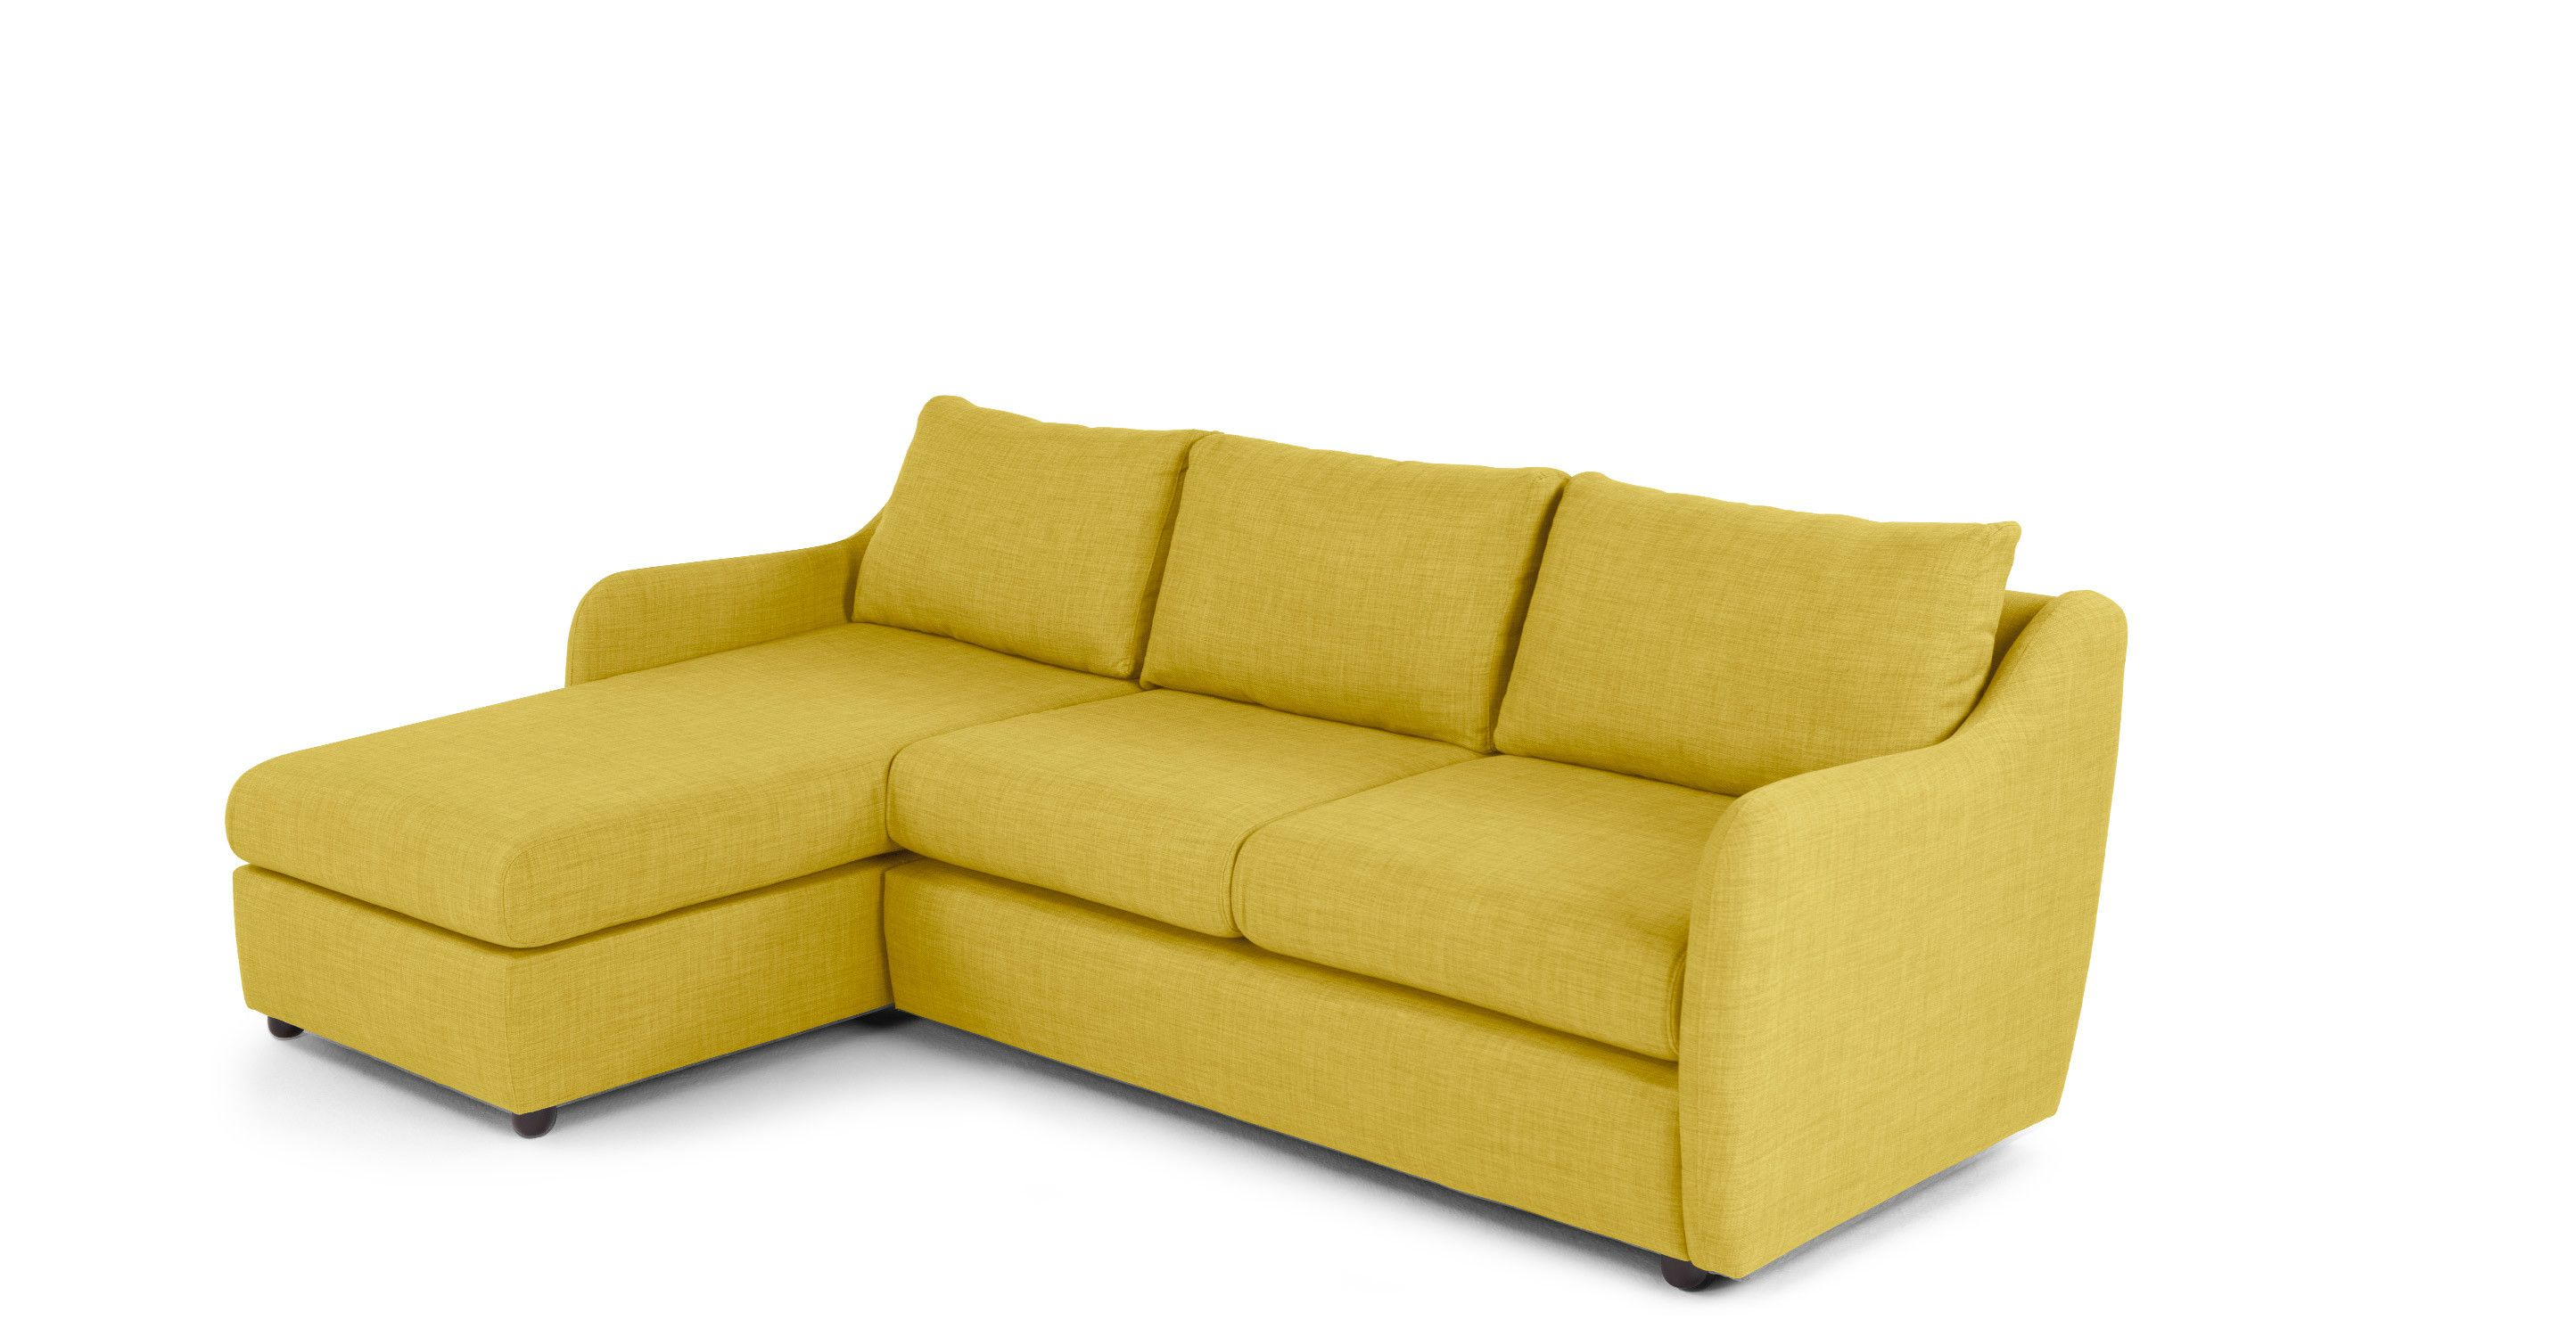 Pin By Chloe Carroll On Interiors Etc Corner Sofa Sofa Sofa Online